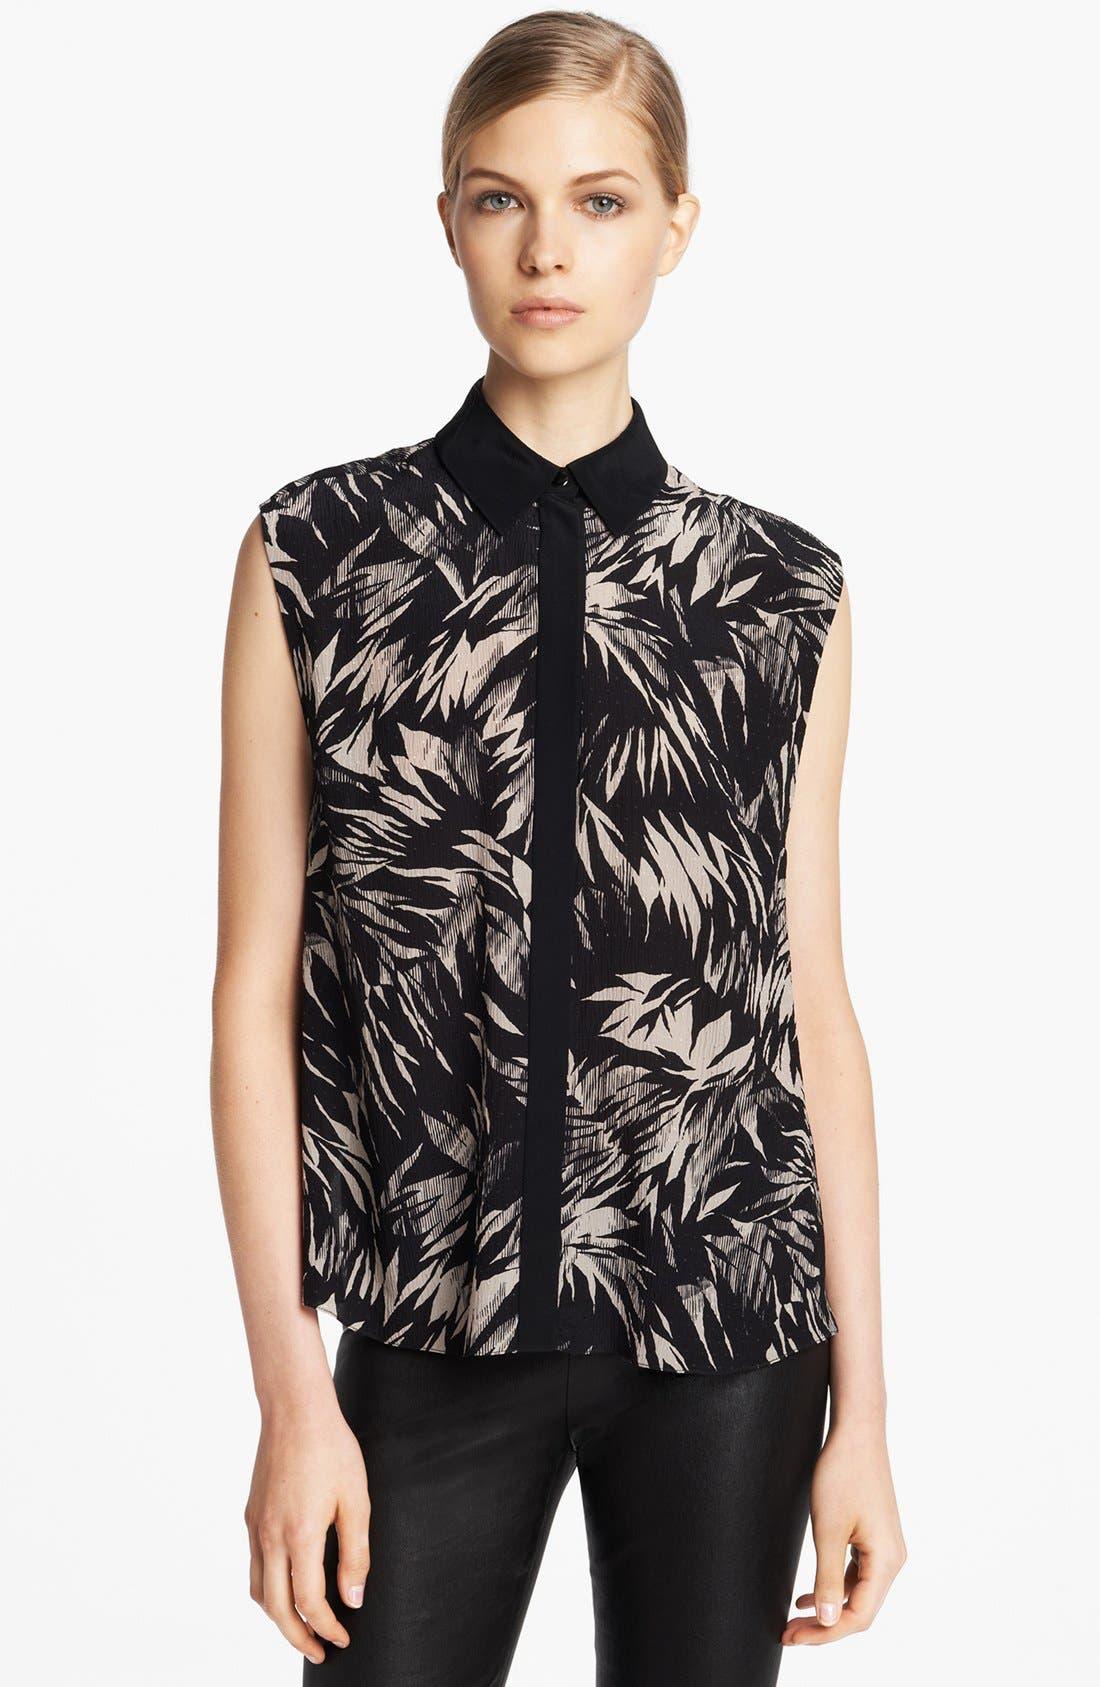 Alternate Image 1 Selected - Jason Wu Botanical Print Crinkle Silk Chiffon Blouse